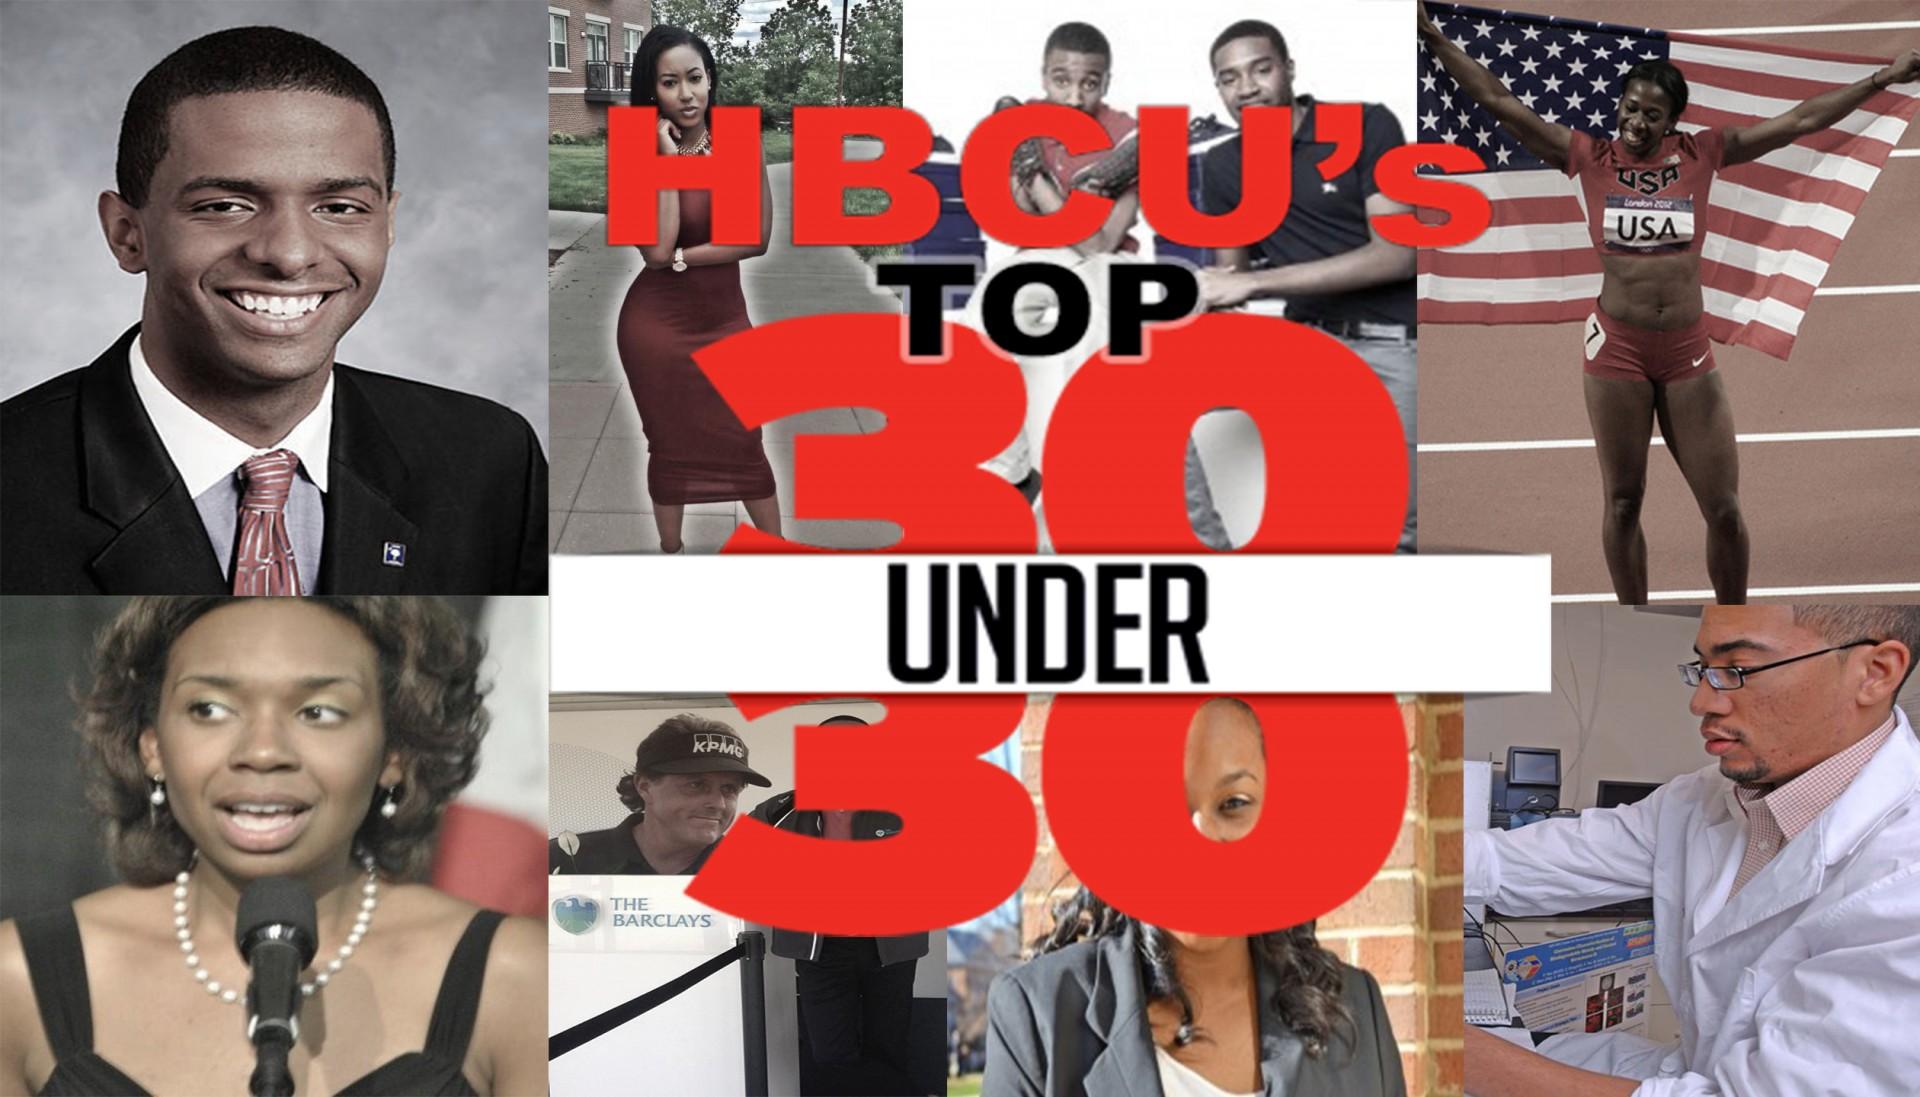 2014 HBCU TOP 30 UNDER 30